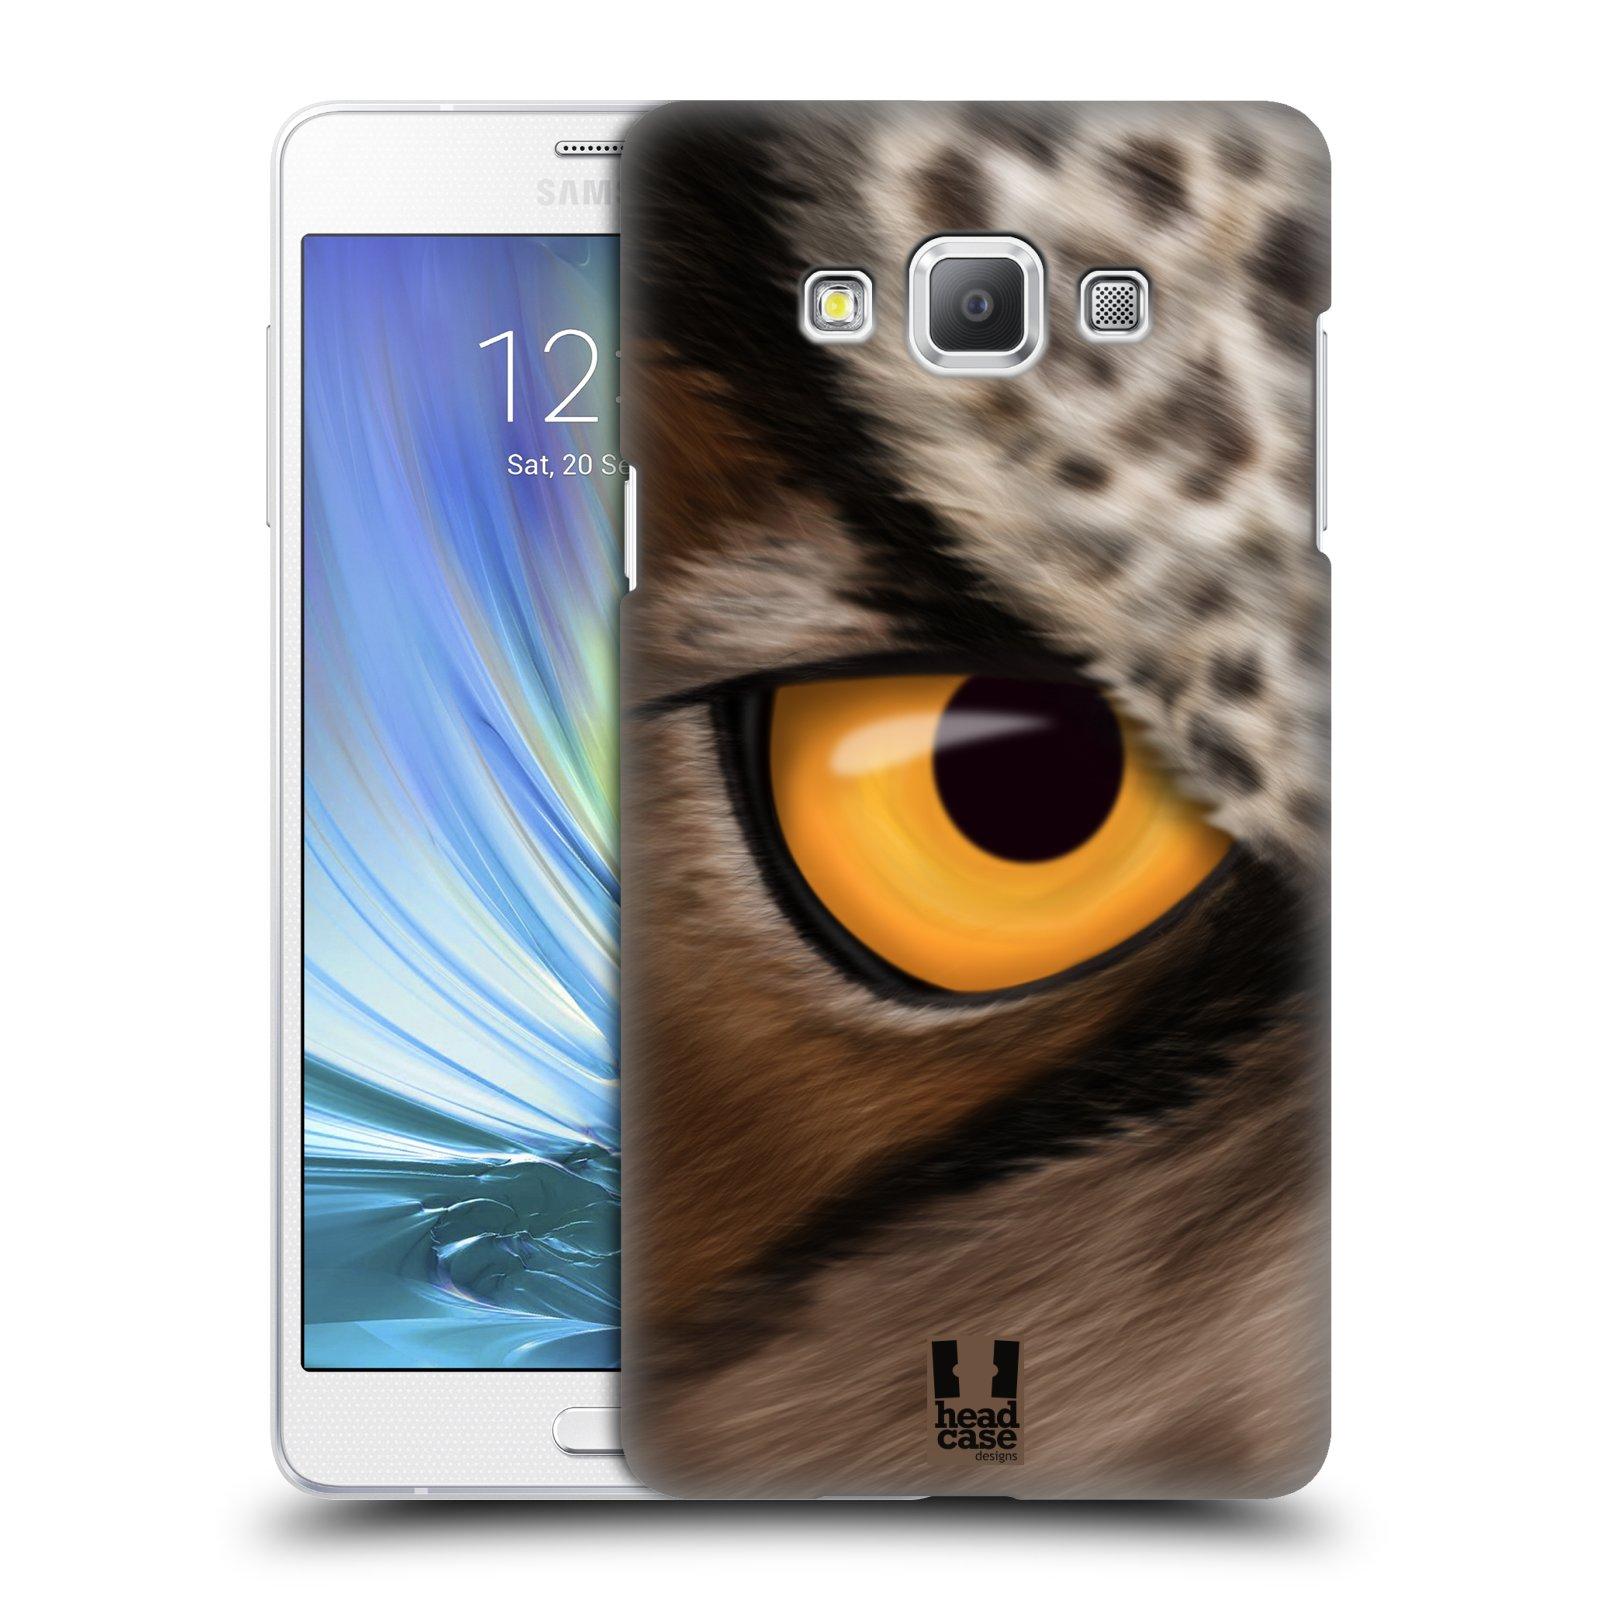 HEAD CASE plastový obal na mobil SAMSUNG GALAXY A7 vzor pohled zvířete oko sova